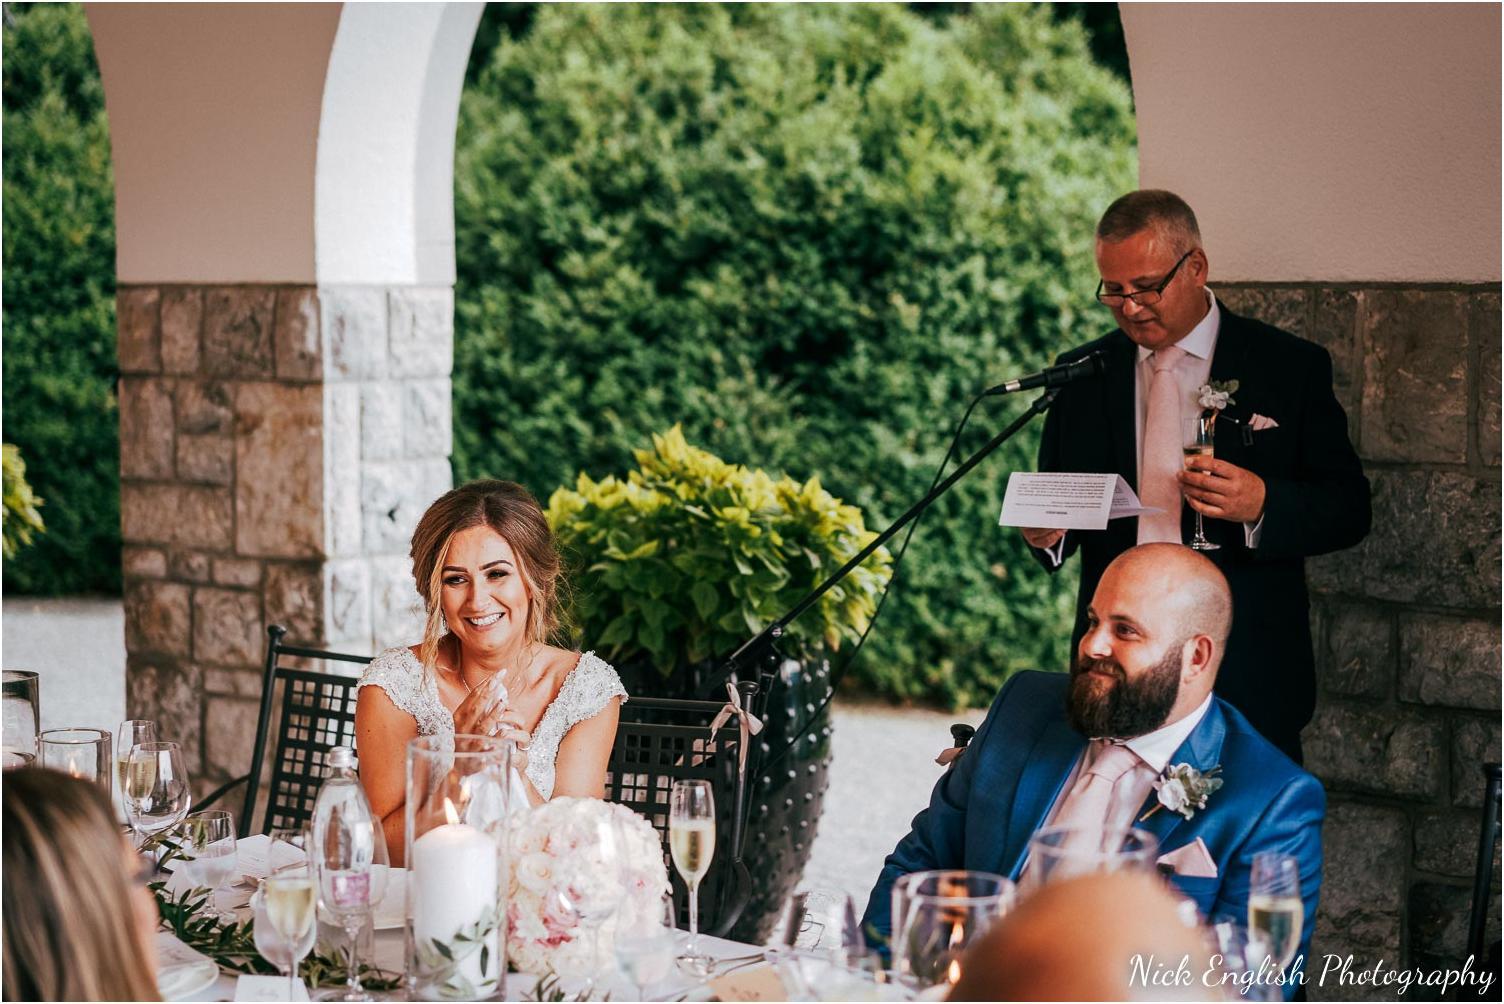 Destination_Wedding_Photographer_Slovenia_Nick_English_Photography-74.jpg